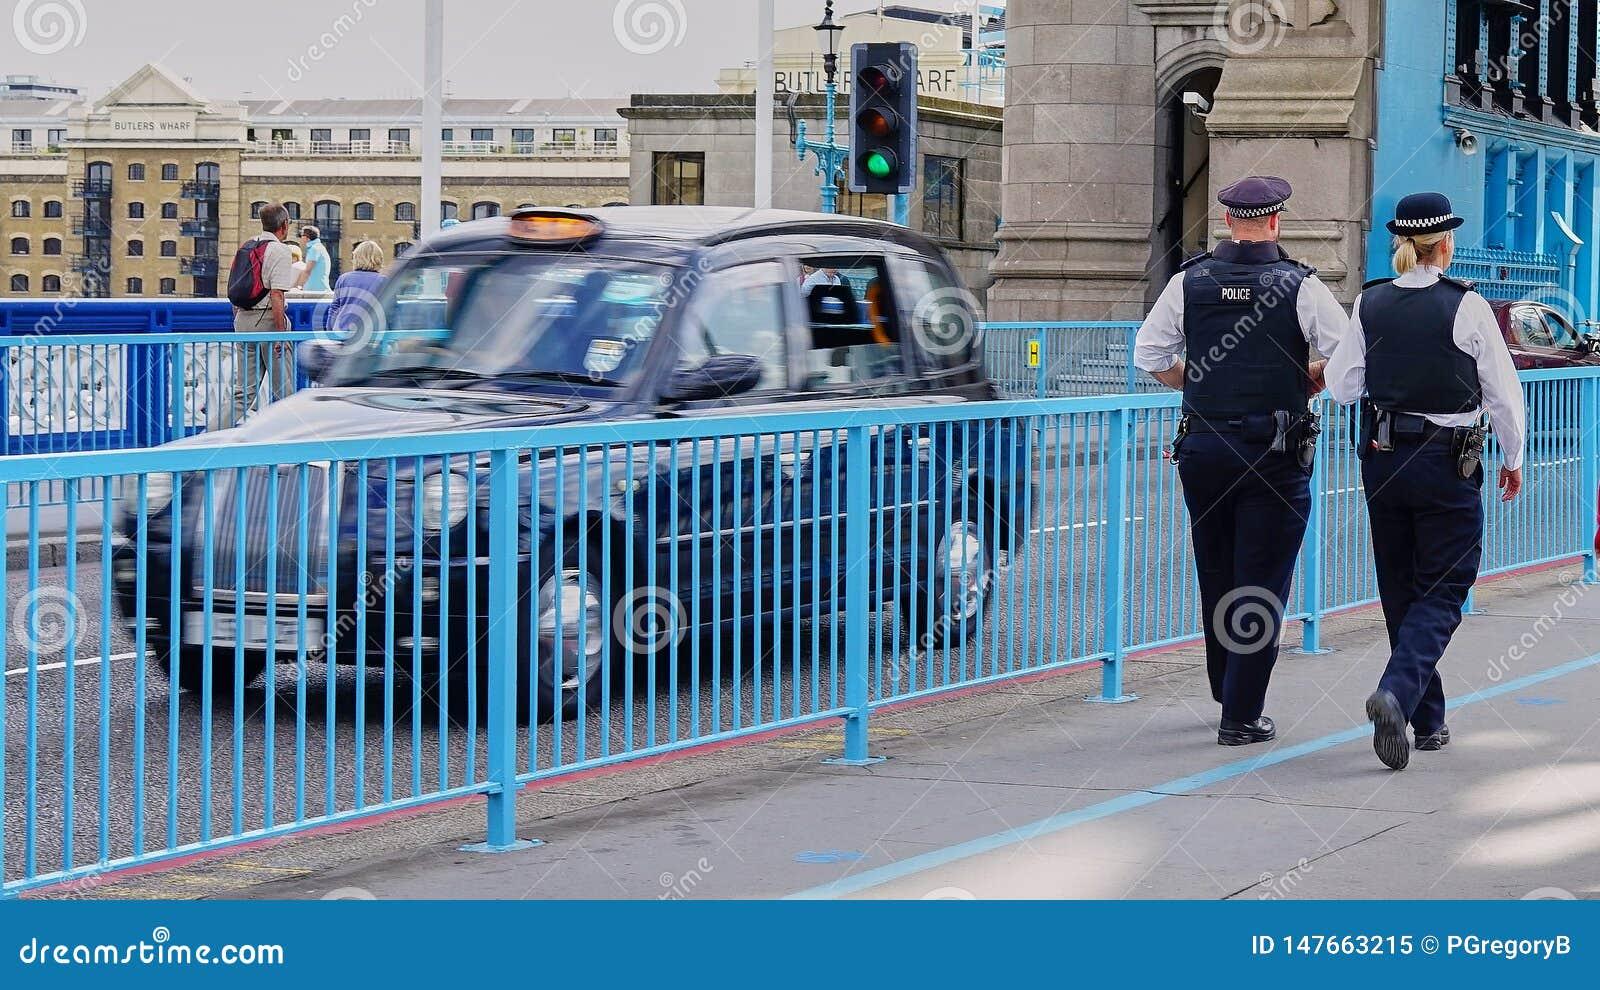 Male and Female Bobbies patrol Tower Bridge